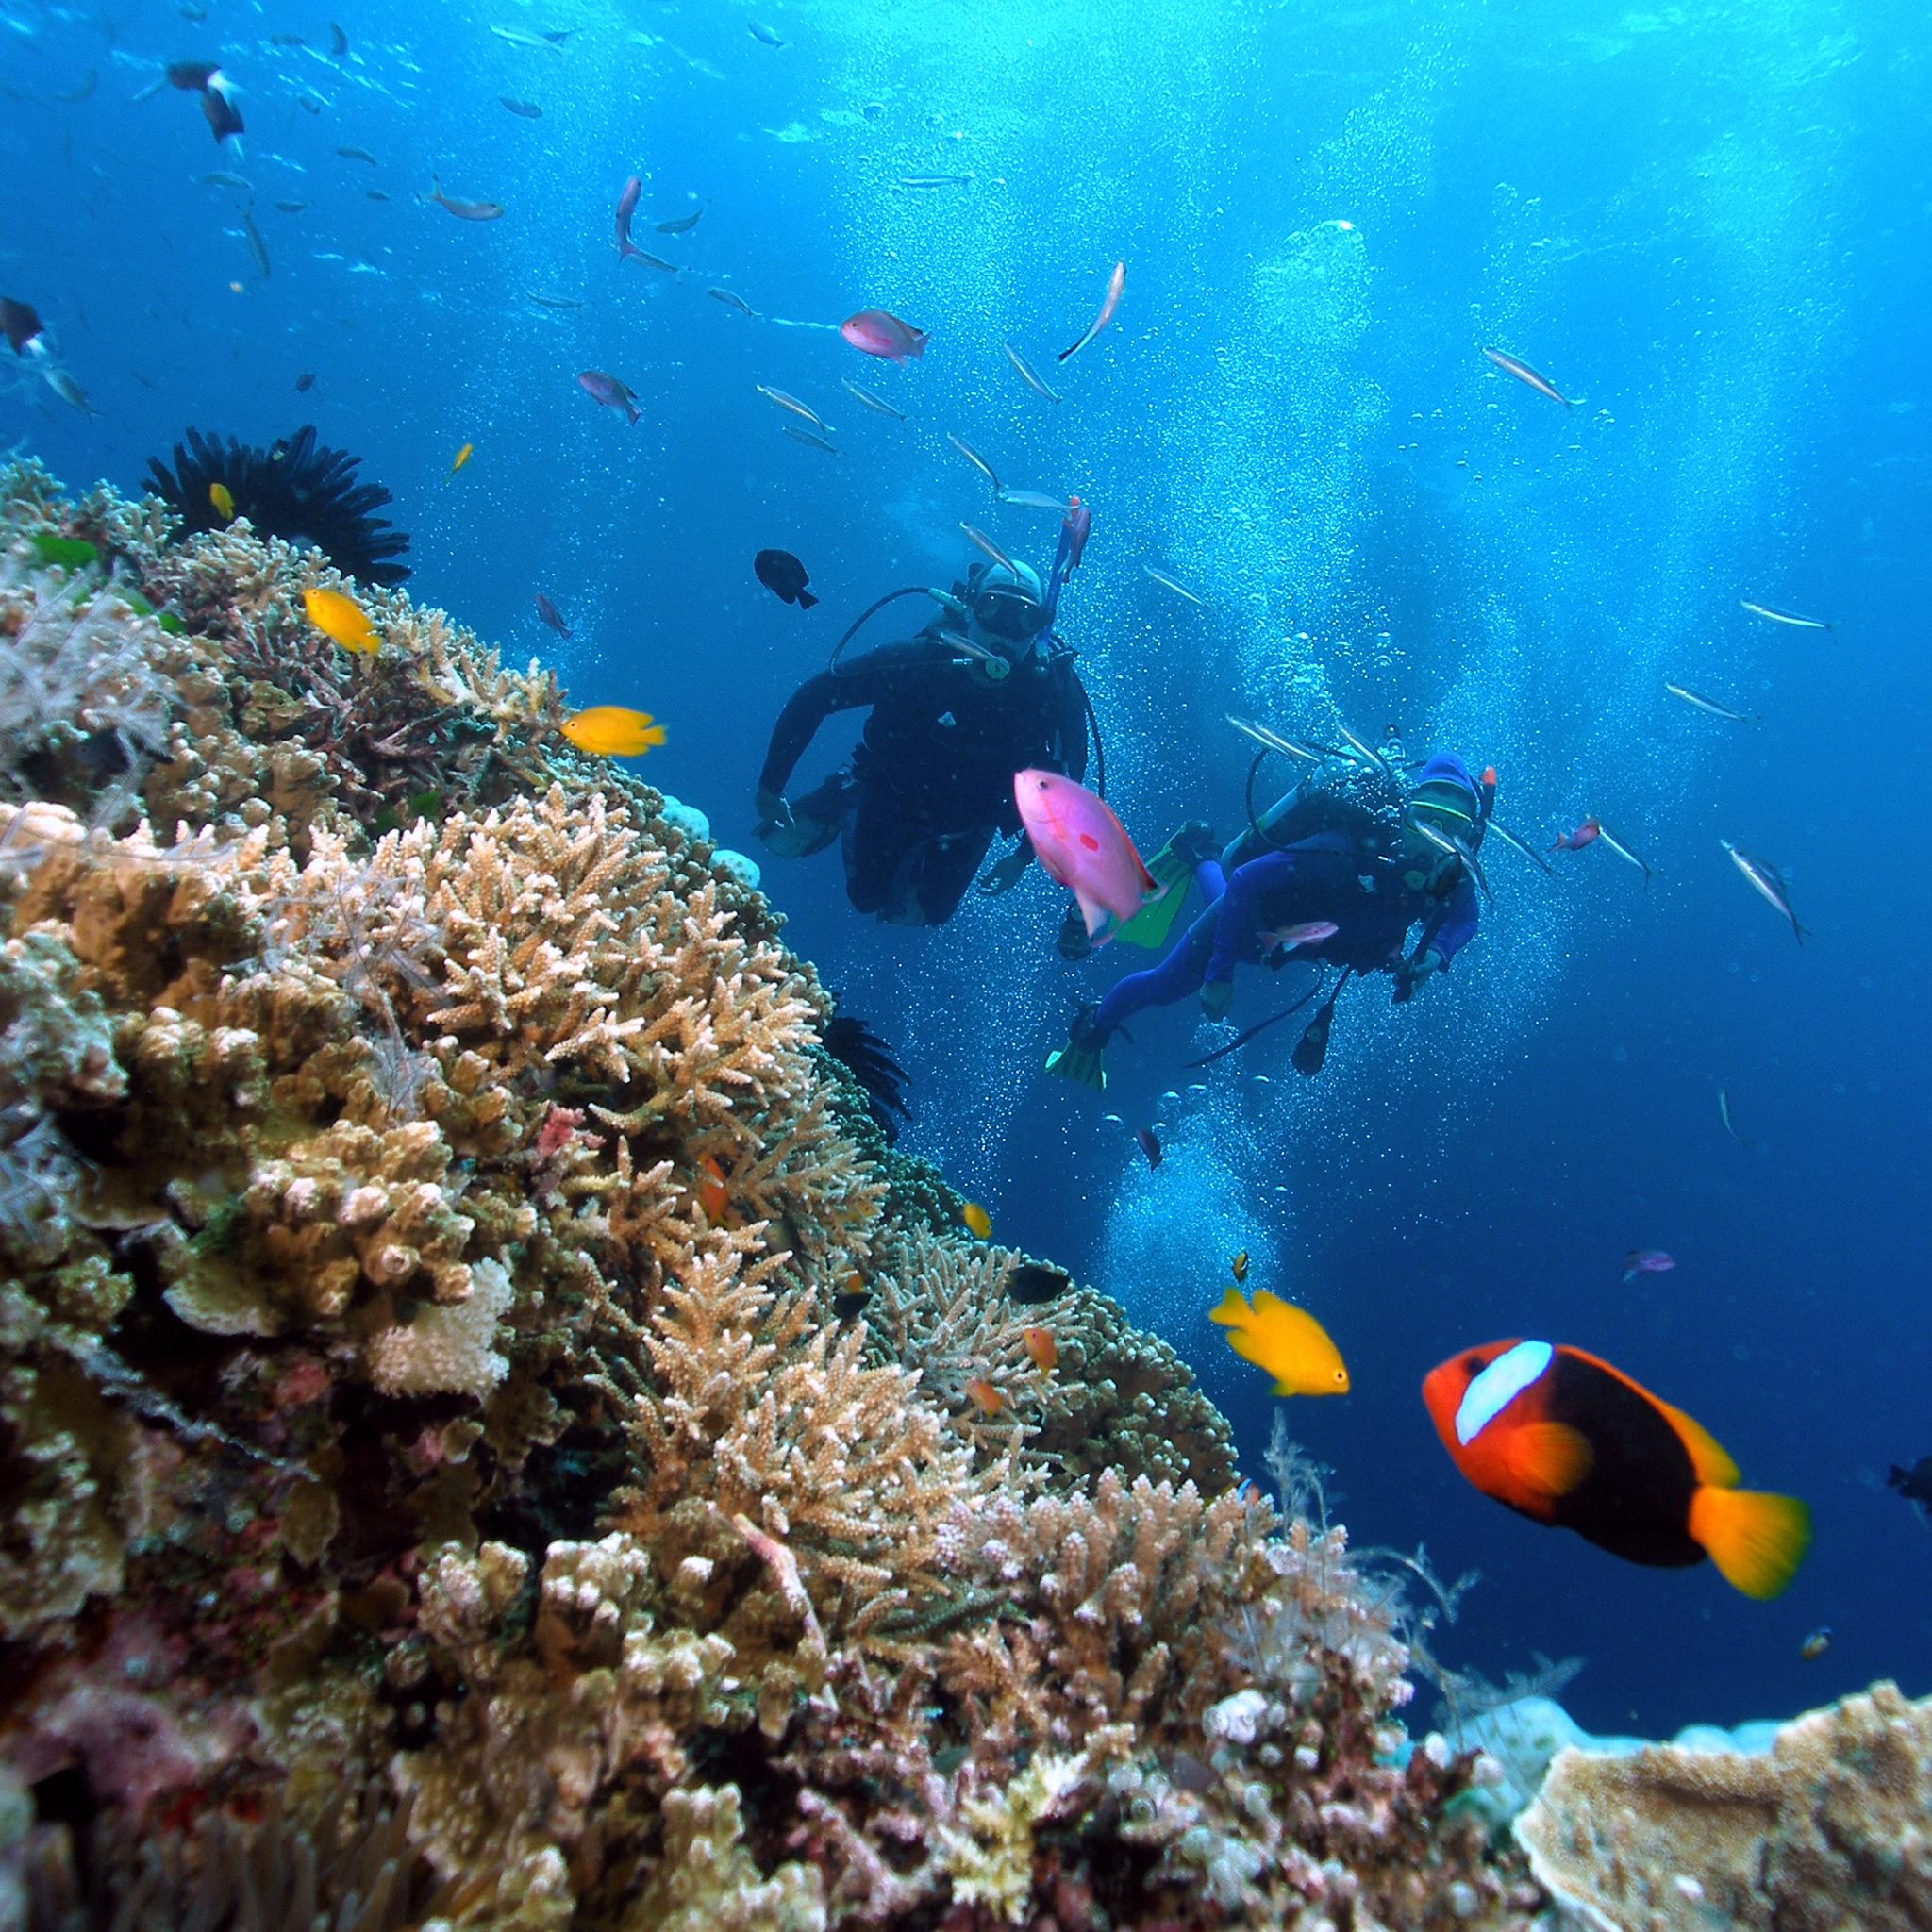 Coral Reef 3Wallpapers iPad Retina Coral Reef   iPad Retina